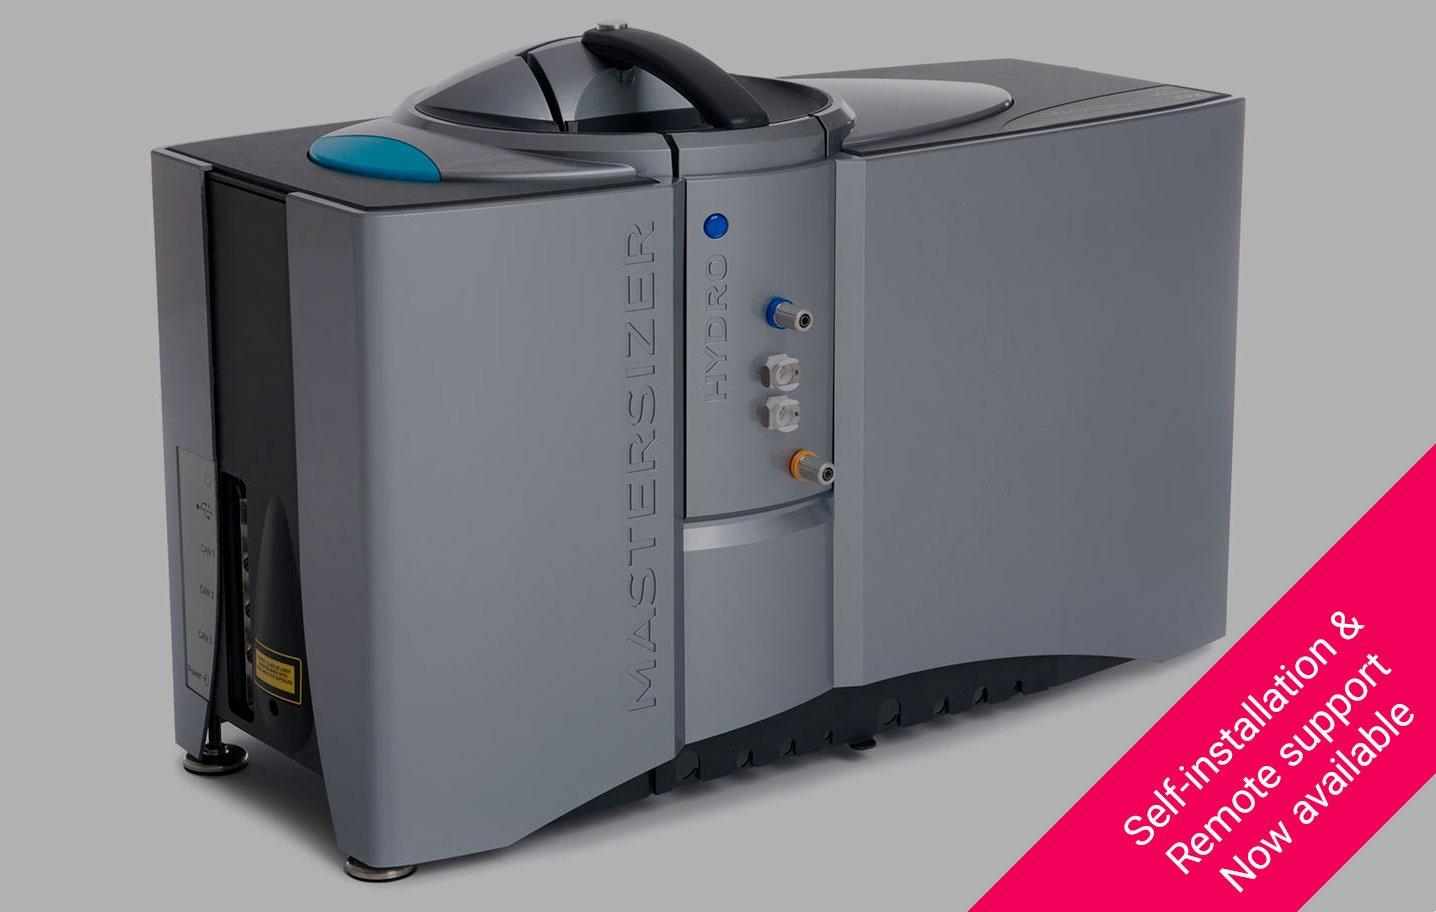 MS3000 Upgrade - image